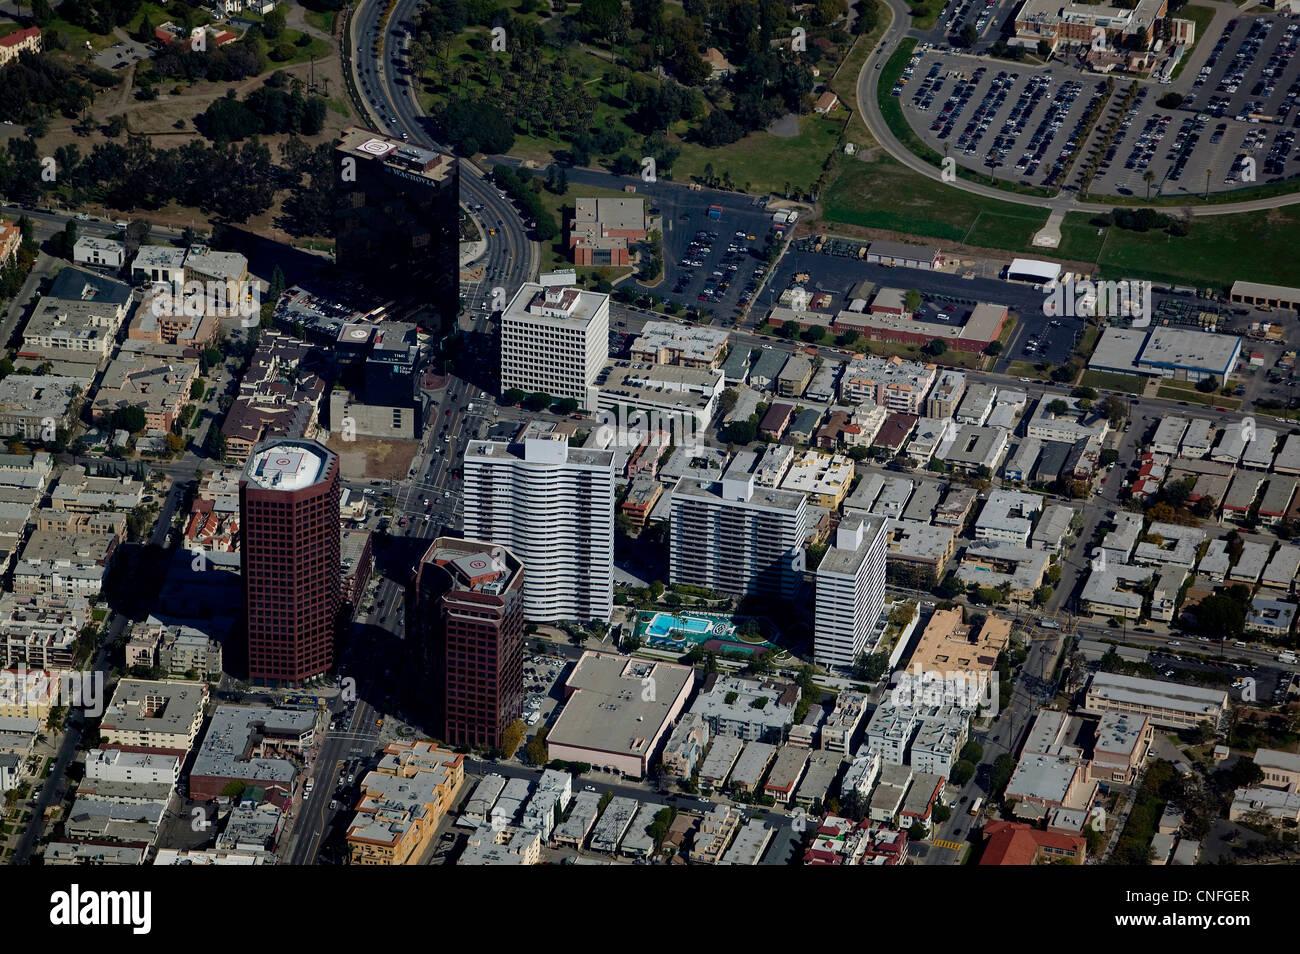 aerial photograph Wilshire Blvd, Wachovia Center, Los Angeles, California - Stock Image